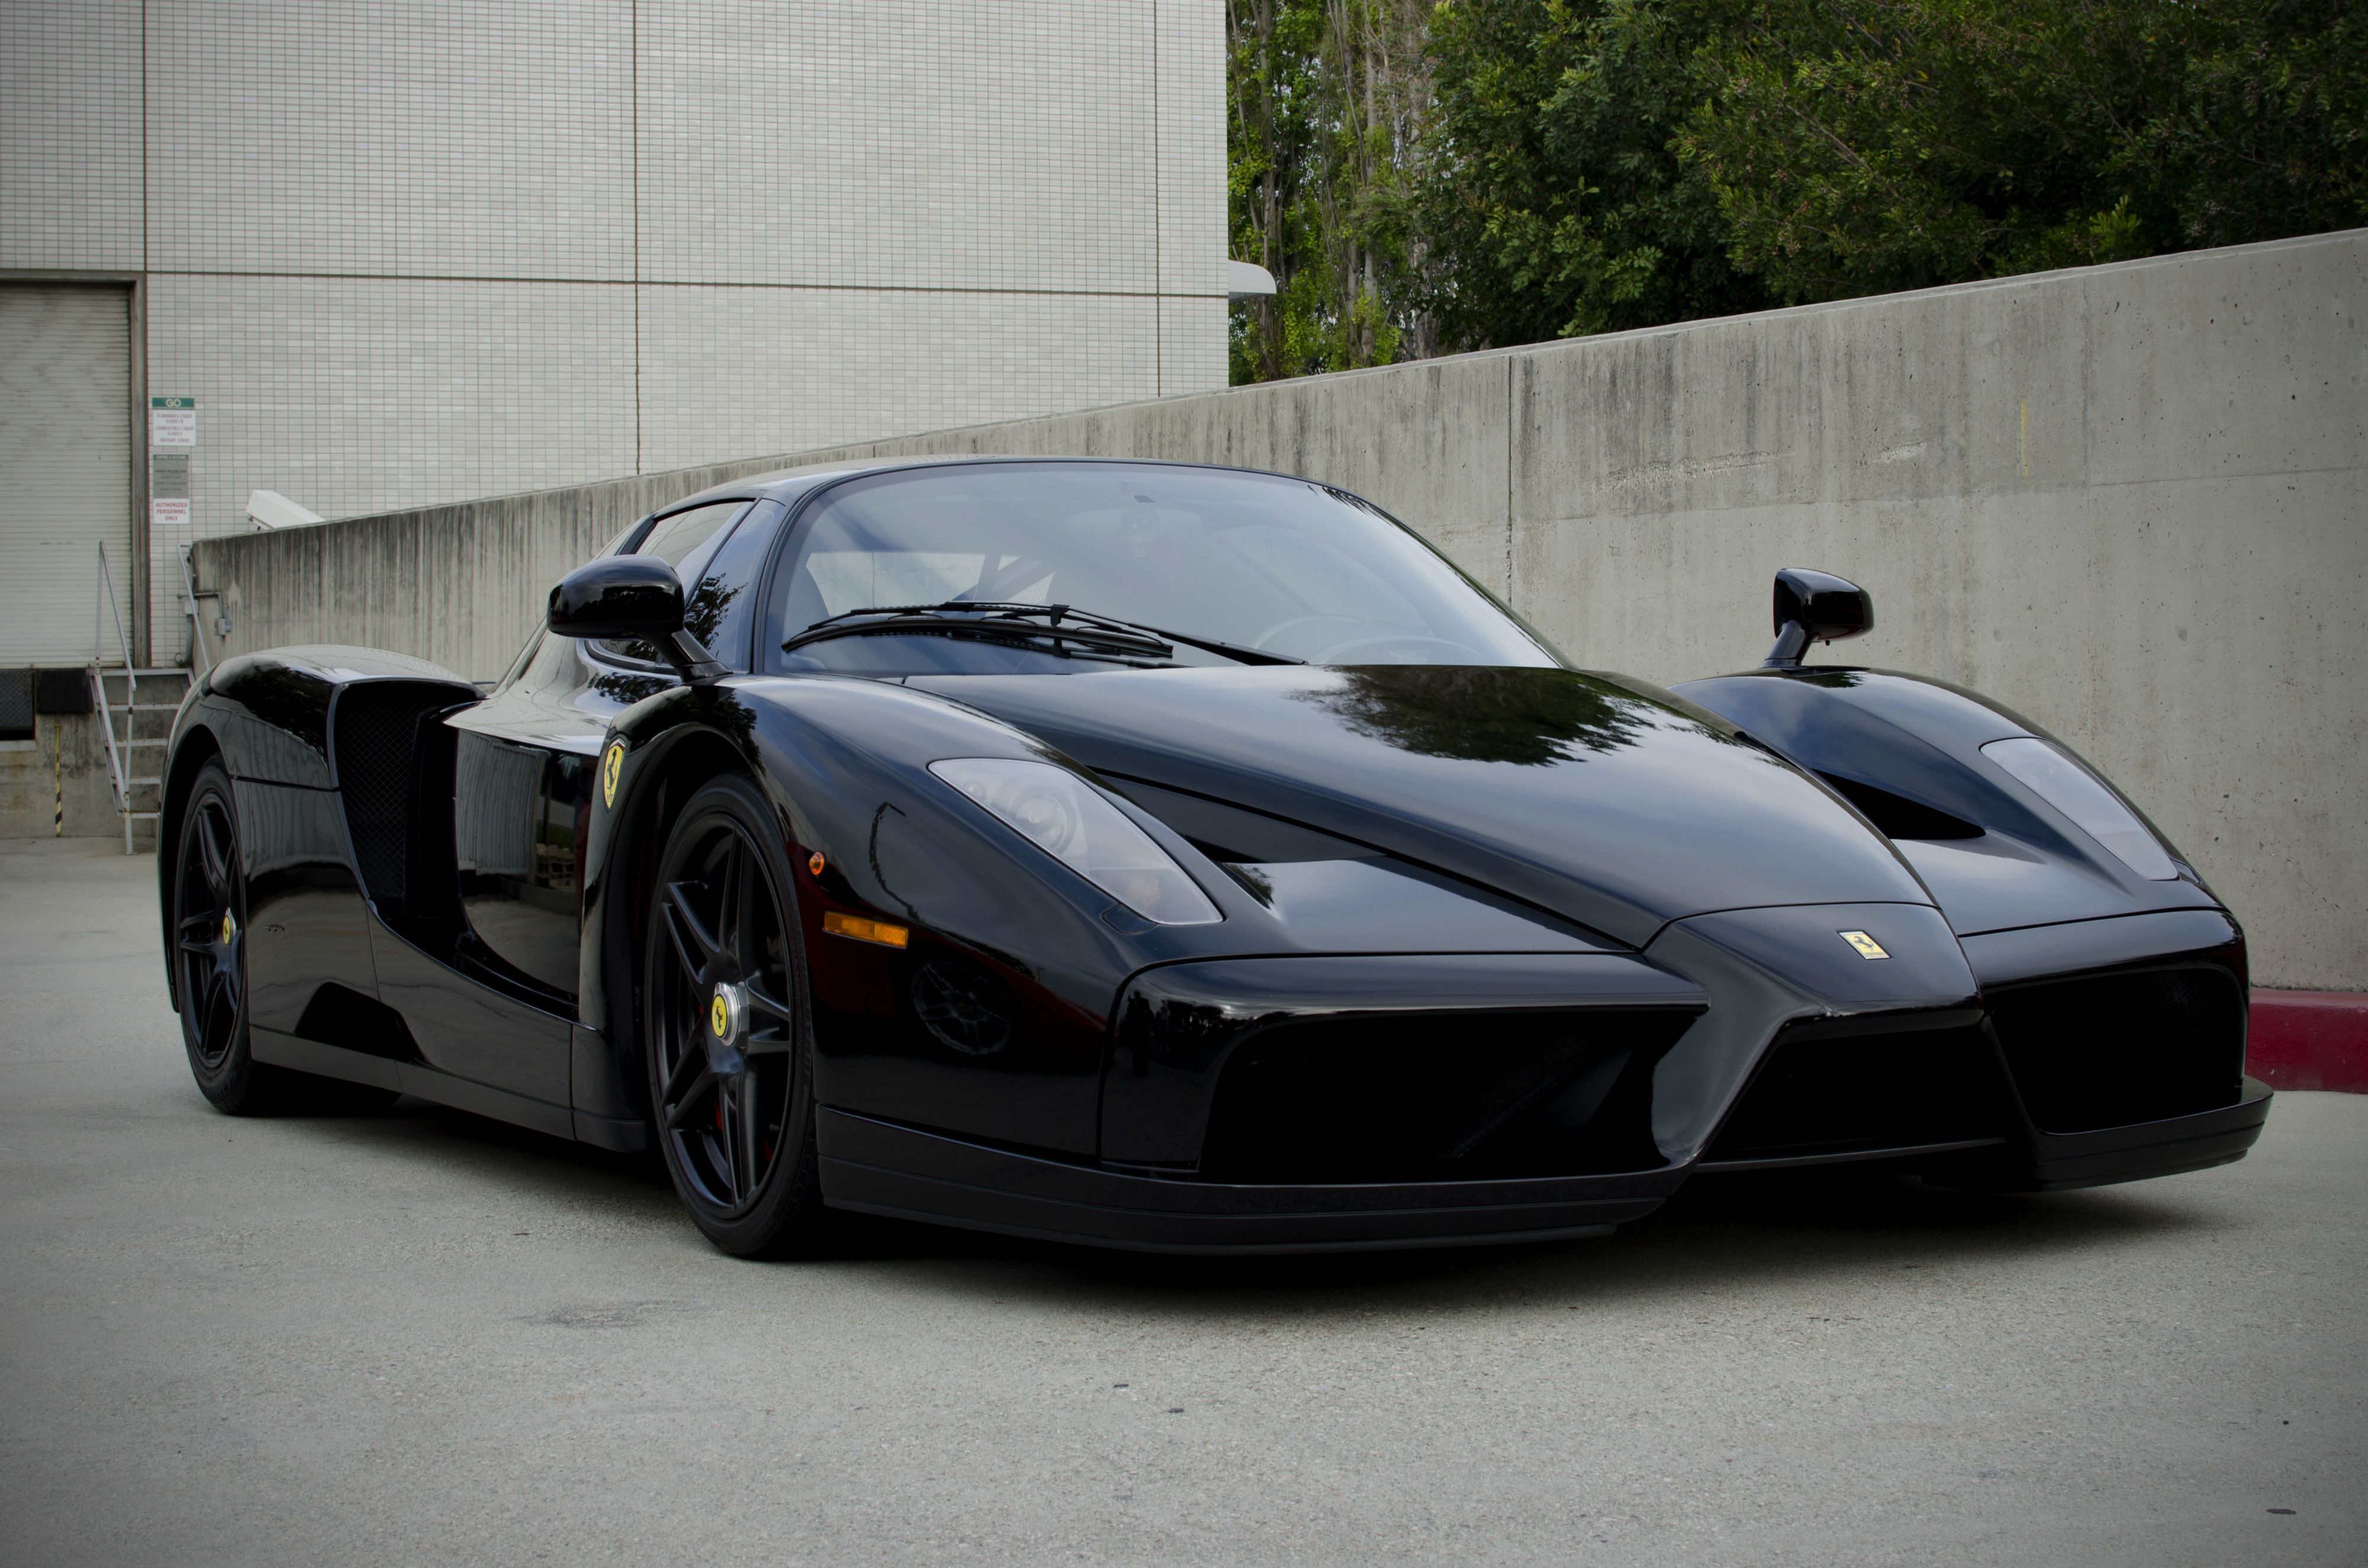 black ferrari wallpaper #kv8 | cars | pinterest | ferrari and cars